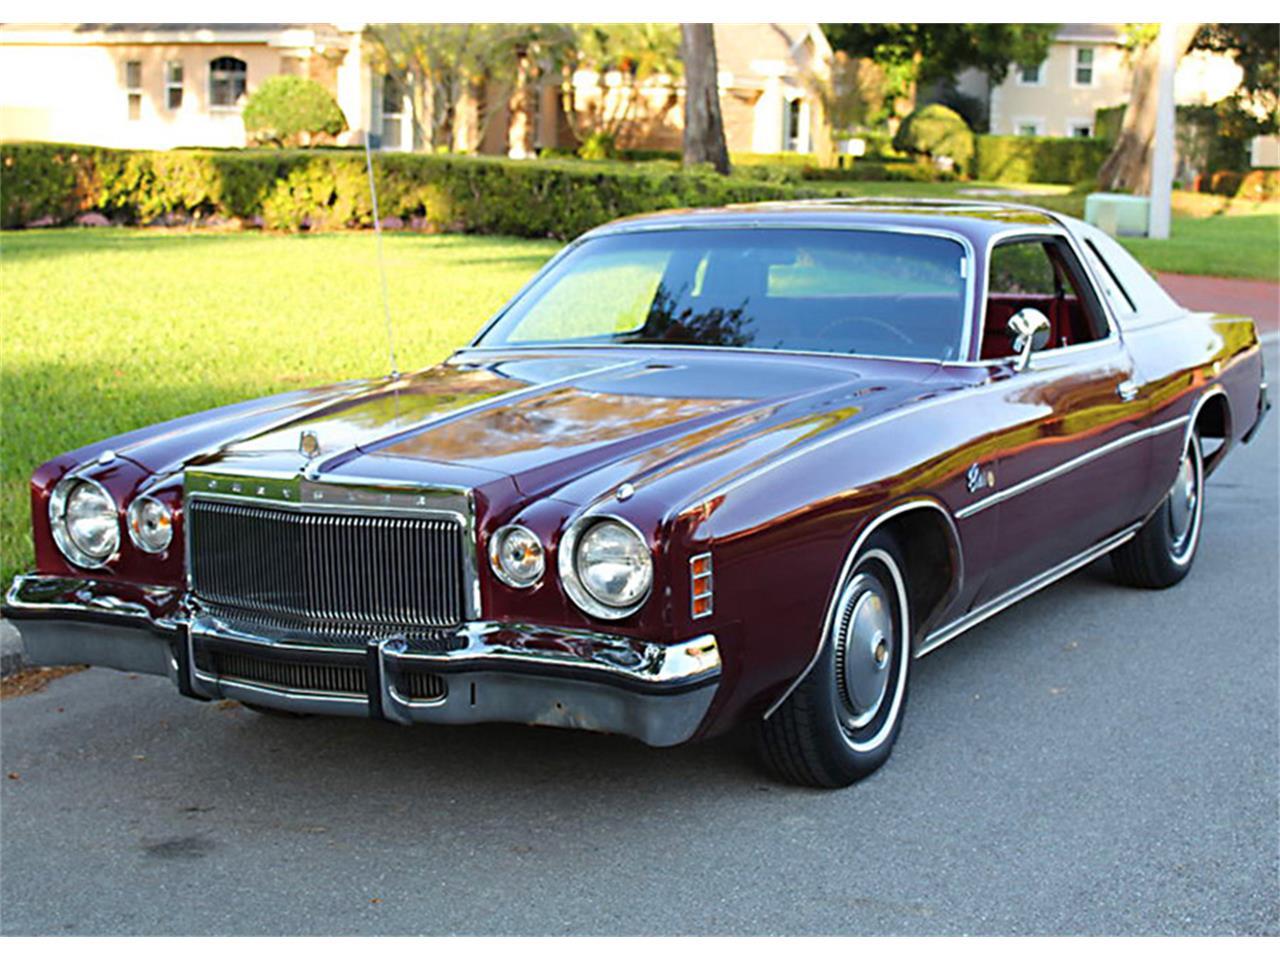 For Sale: 1976 Chrysler Cordoba in Lakeland, Florida on